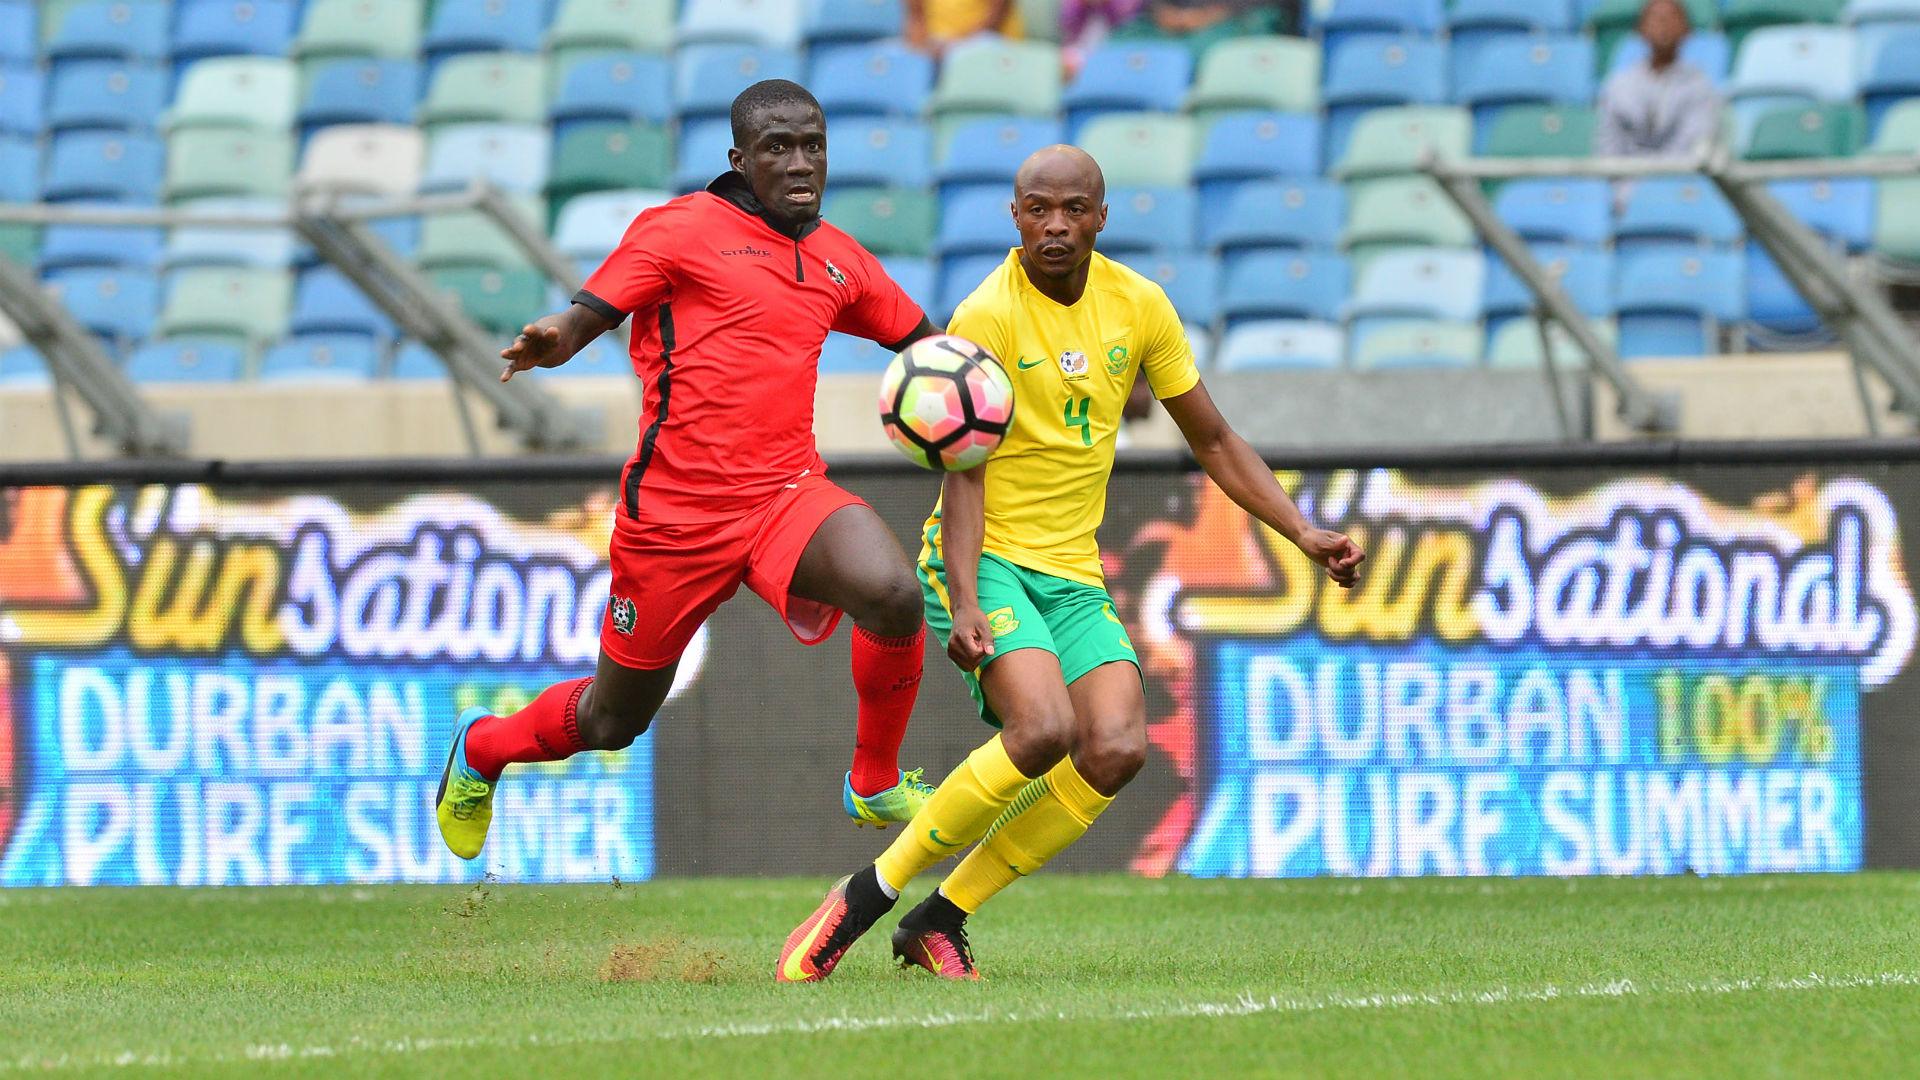 Tebogo Langerman Bafana Bafana